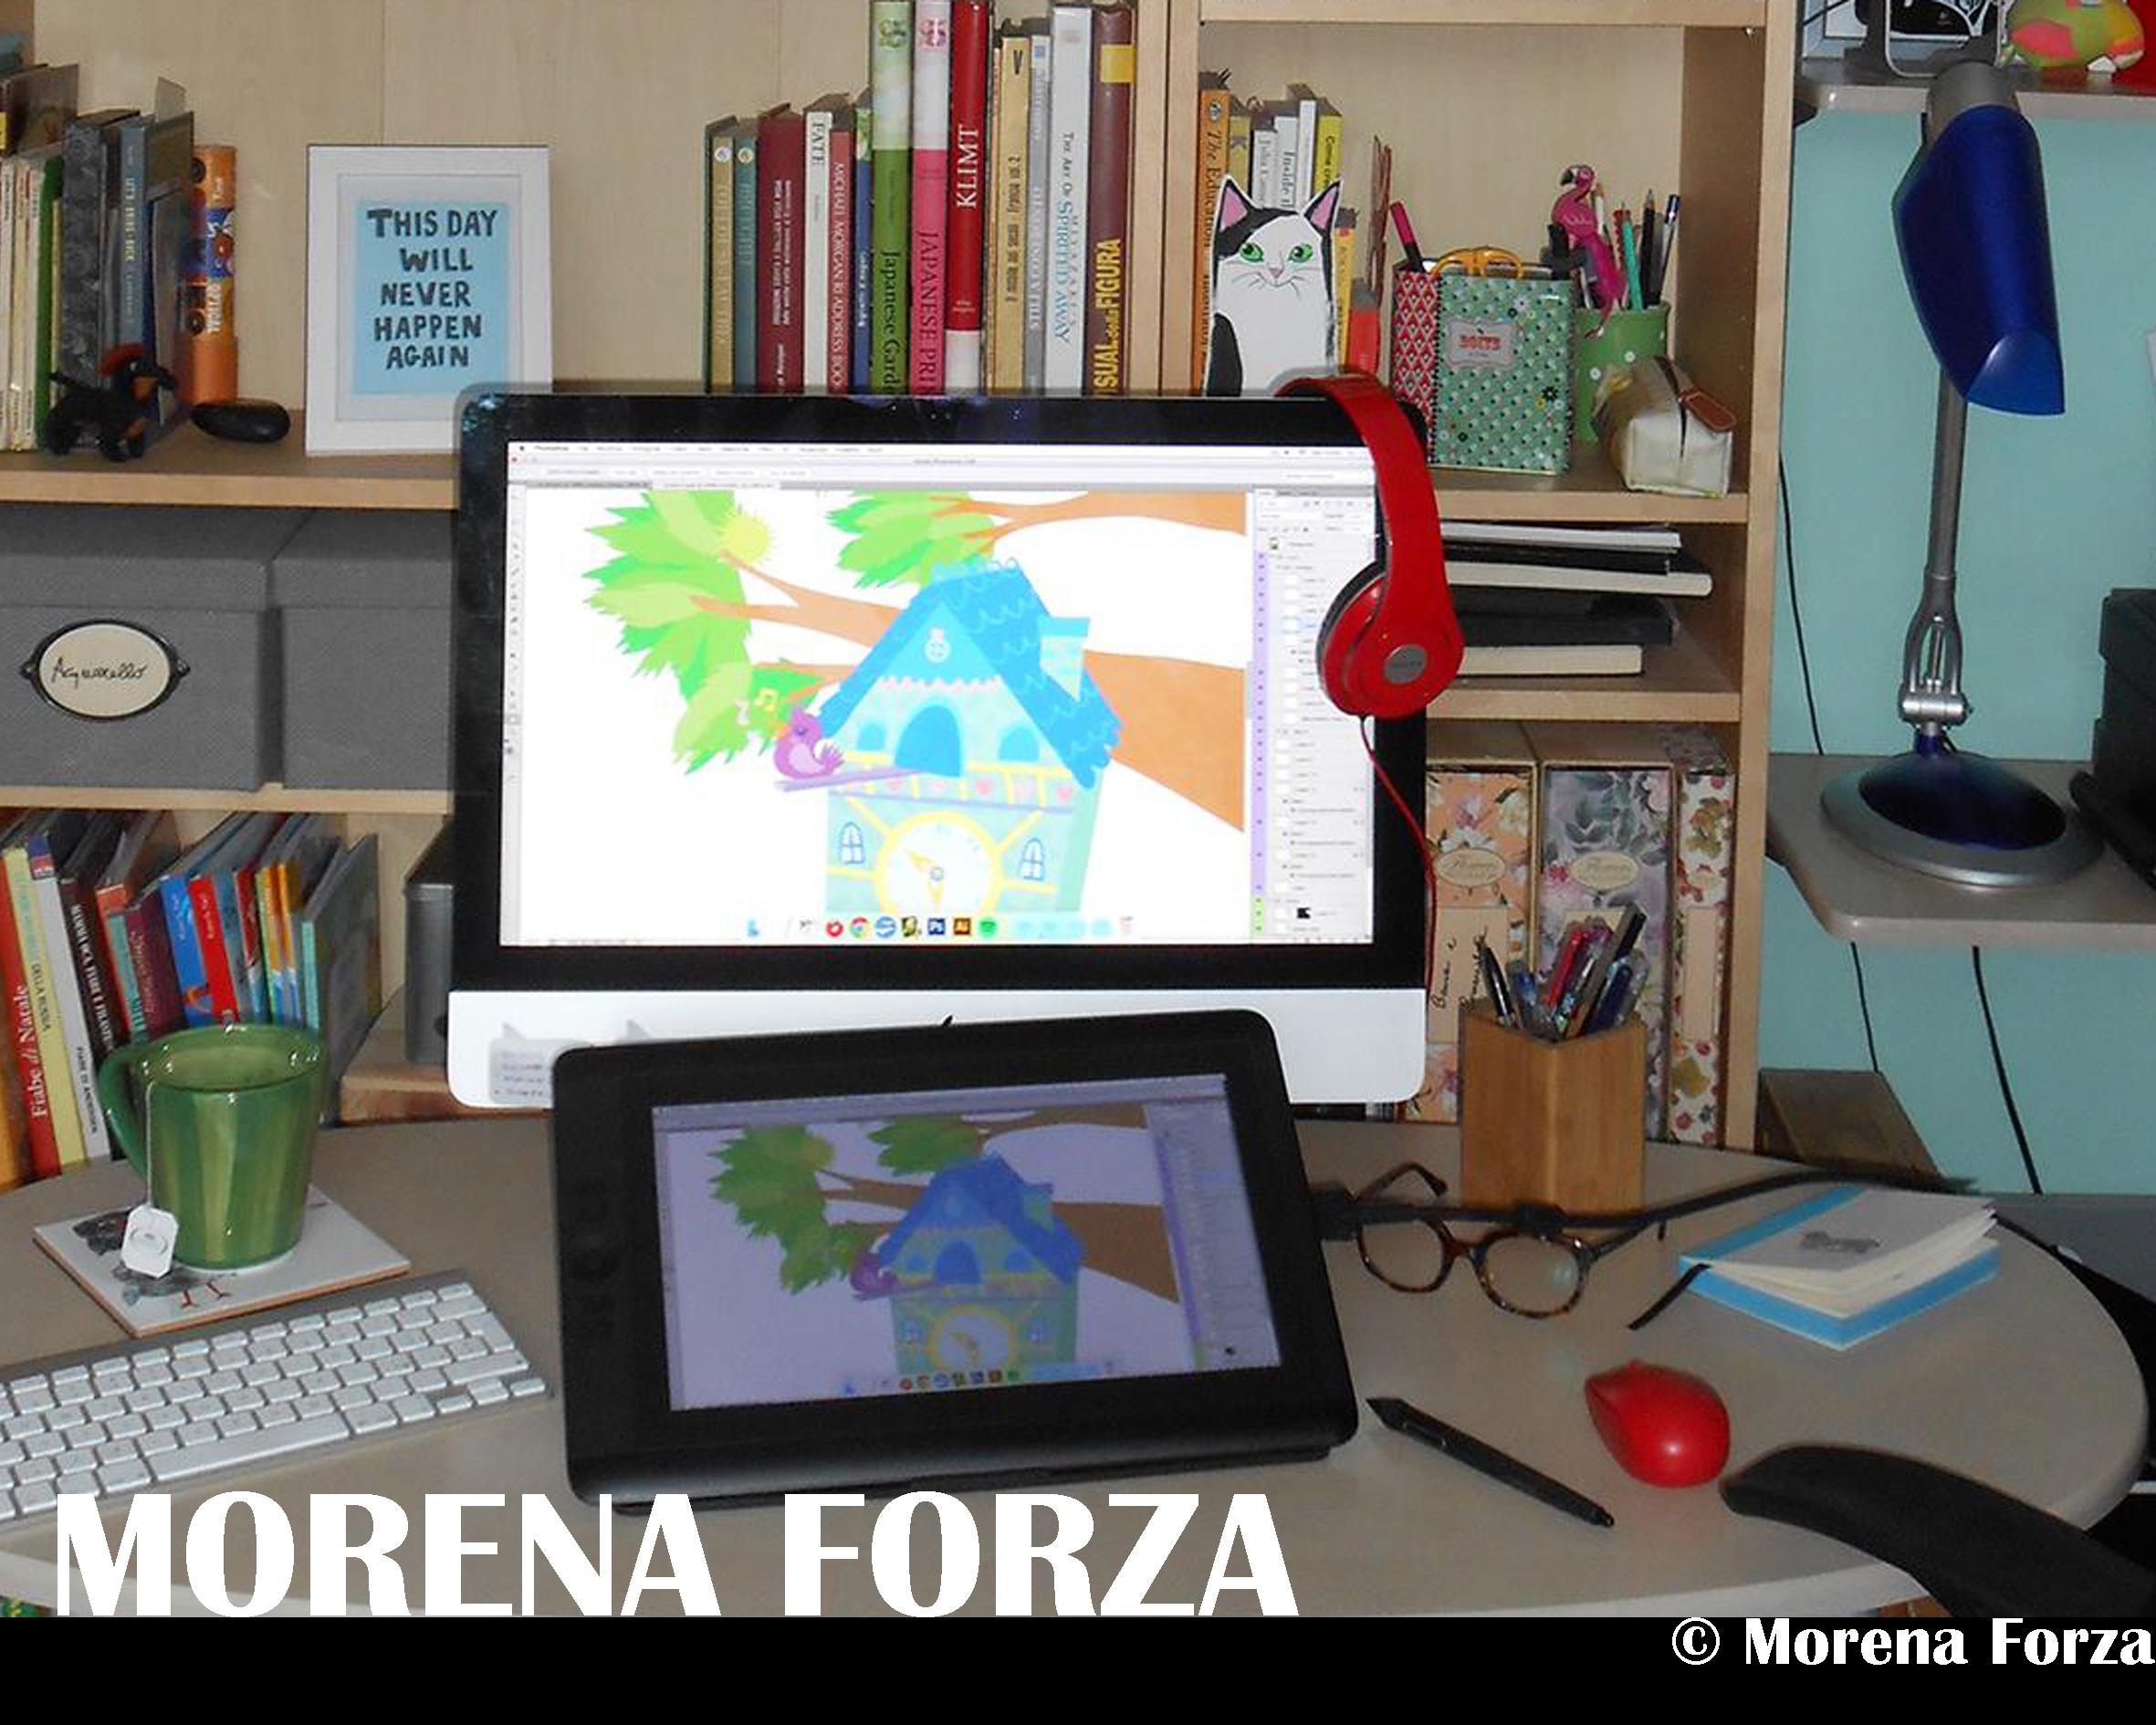 Morena Forza